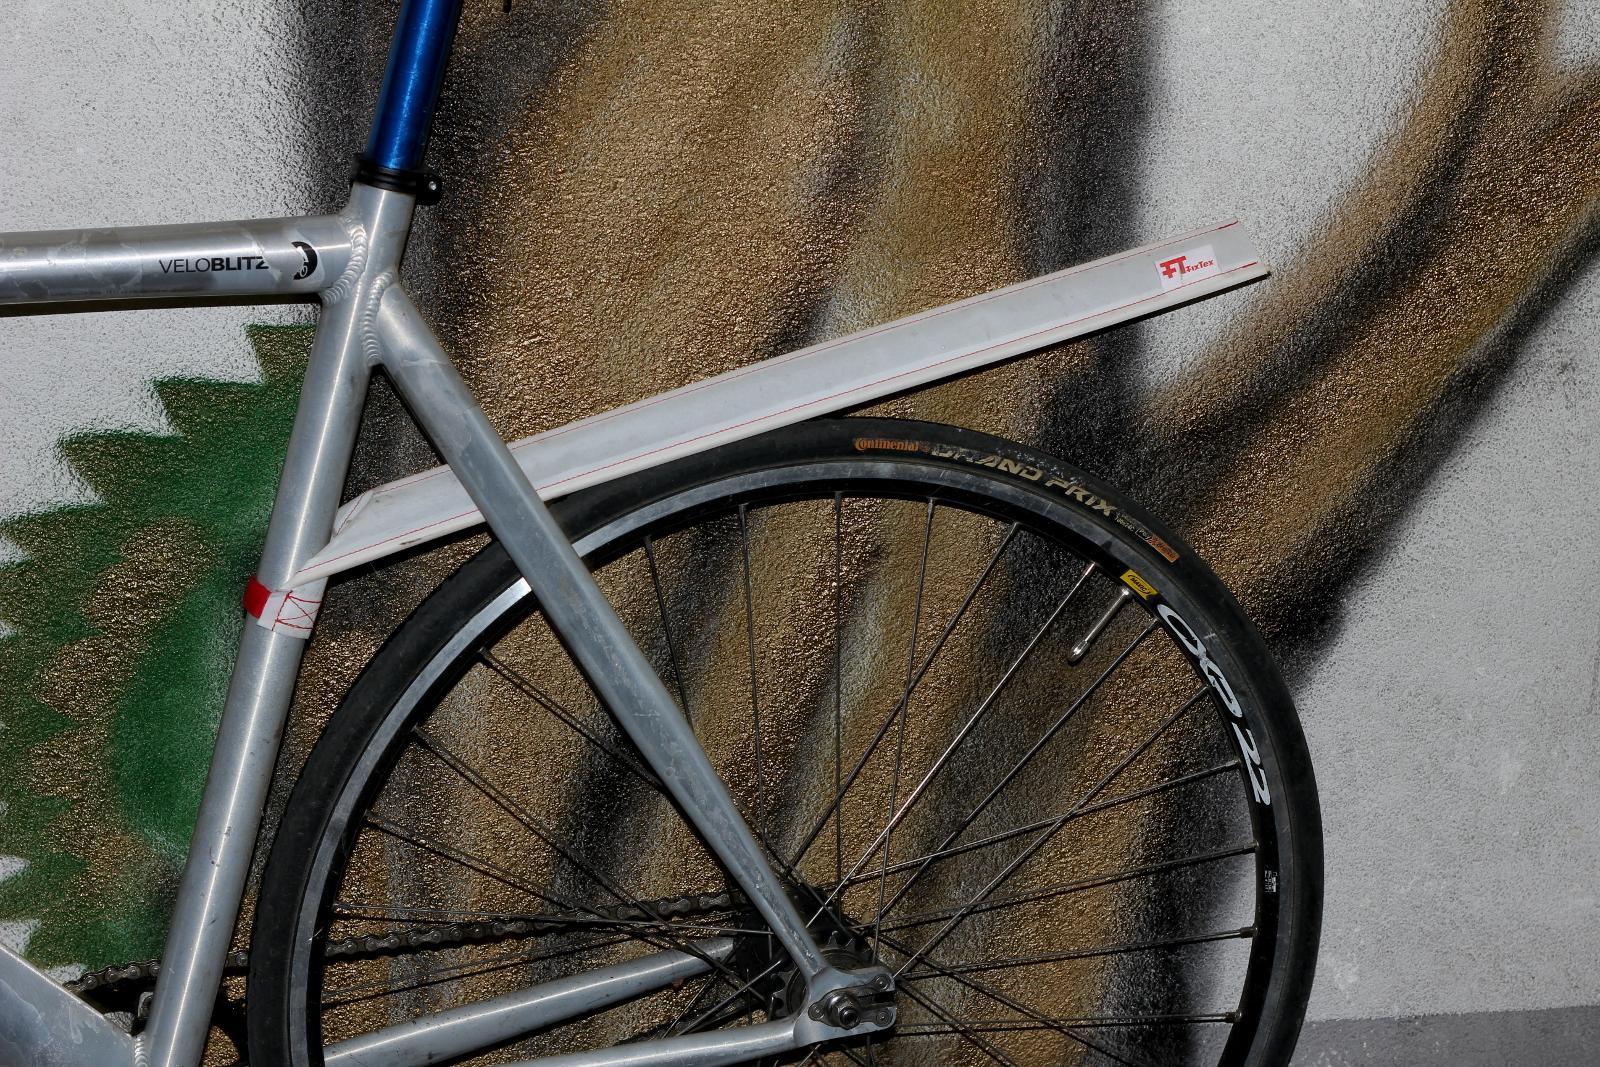 fixtex fahrrad schutzblech im test. Black Bedroom Furniture Sets. Home Design Ideas